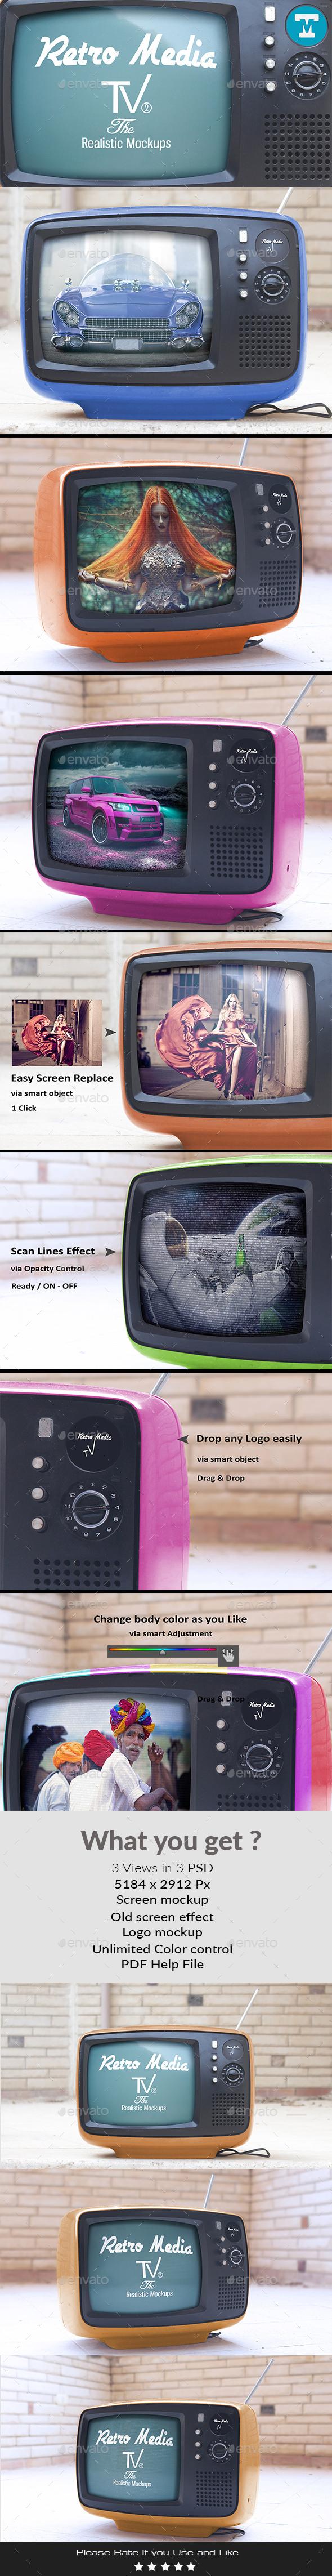 Retro Media Tv - The Realistic Mockups V2 - Miscellaneous Displays